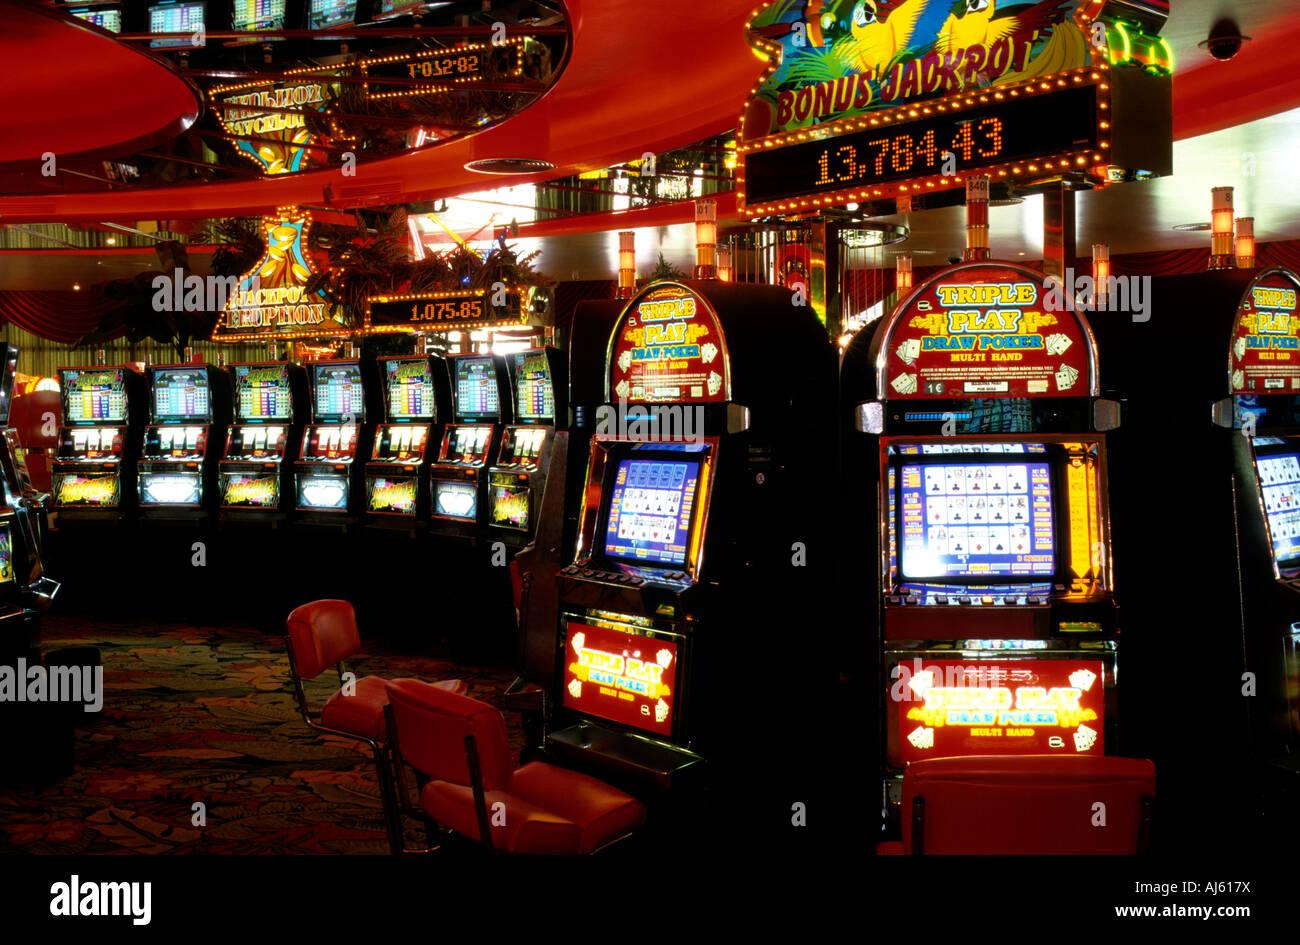 Adrian lewis slot machine